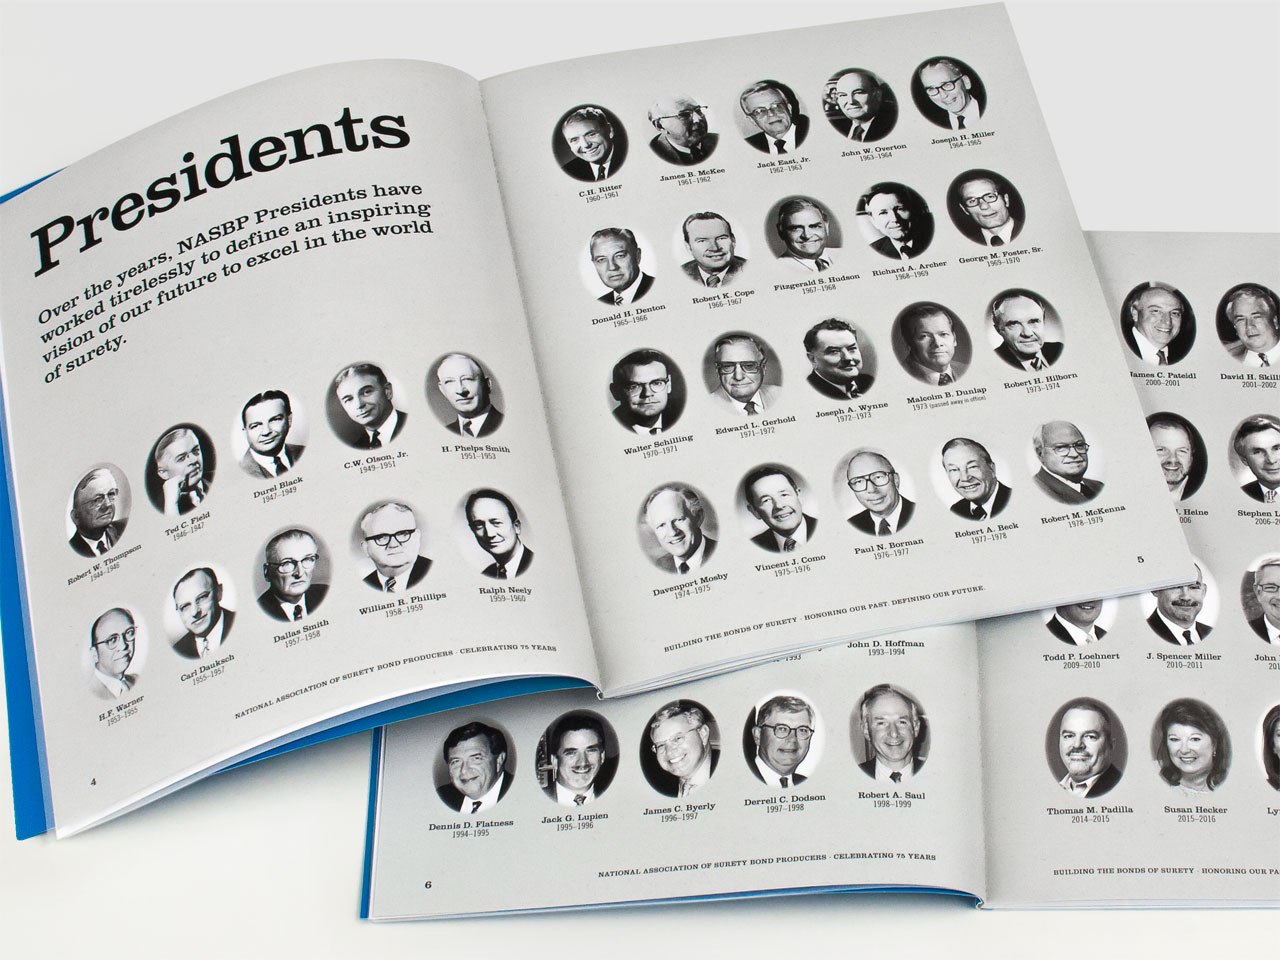 NASBP 75th Anniversary Brochure